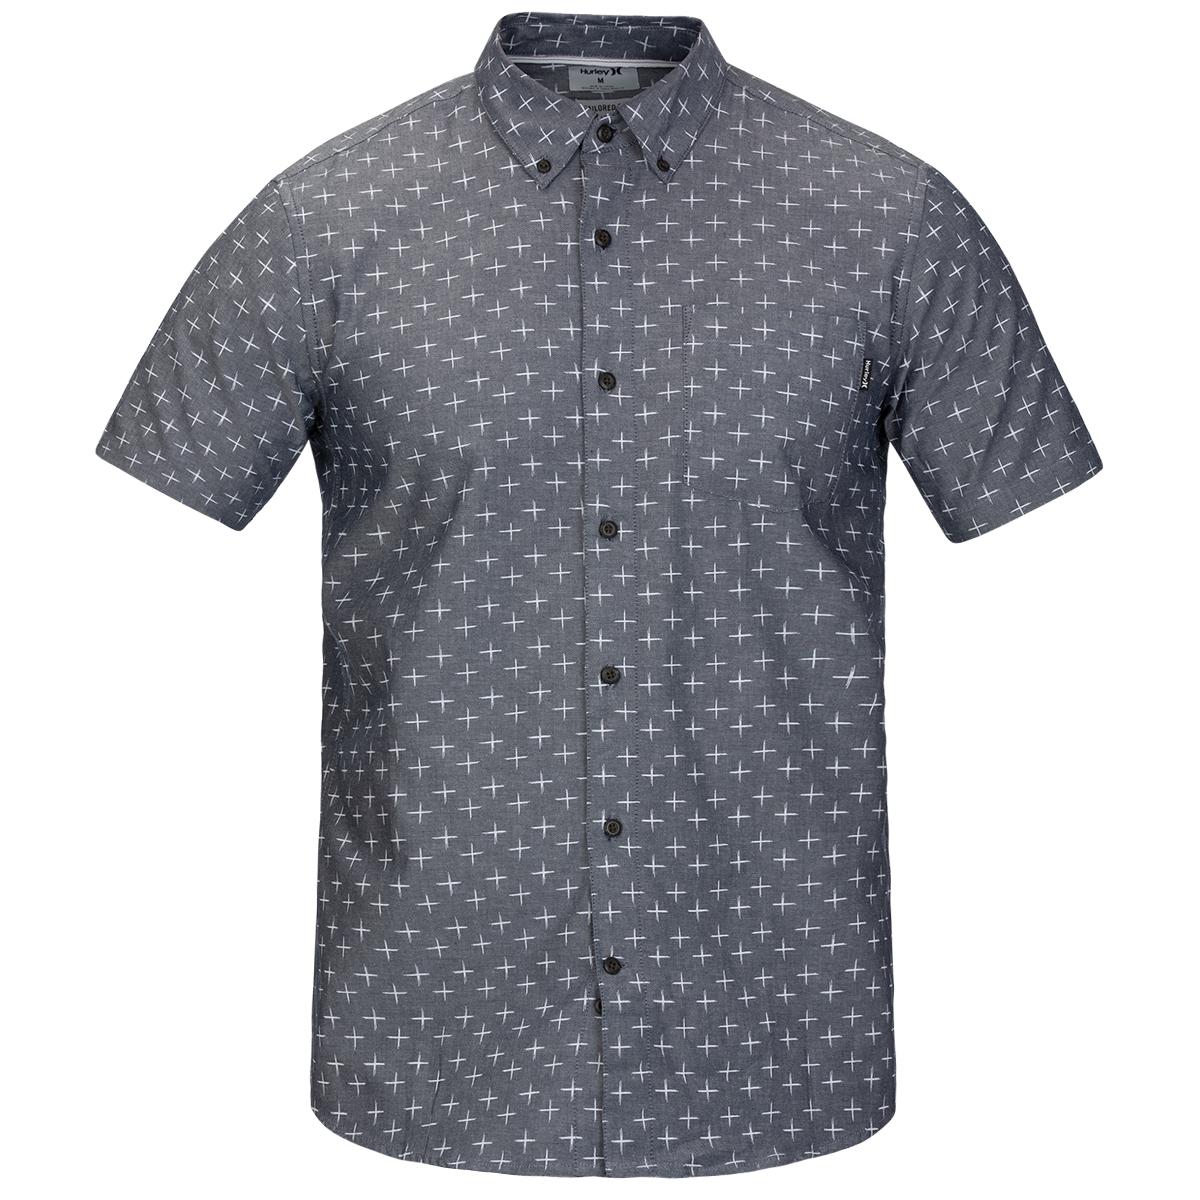 Hurley Men's Short-Sleeve Tokyo Shirt - Blue, S